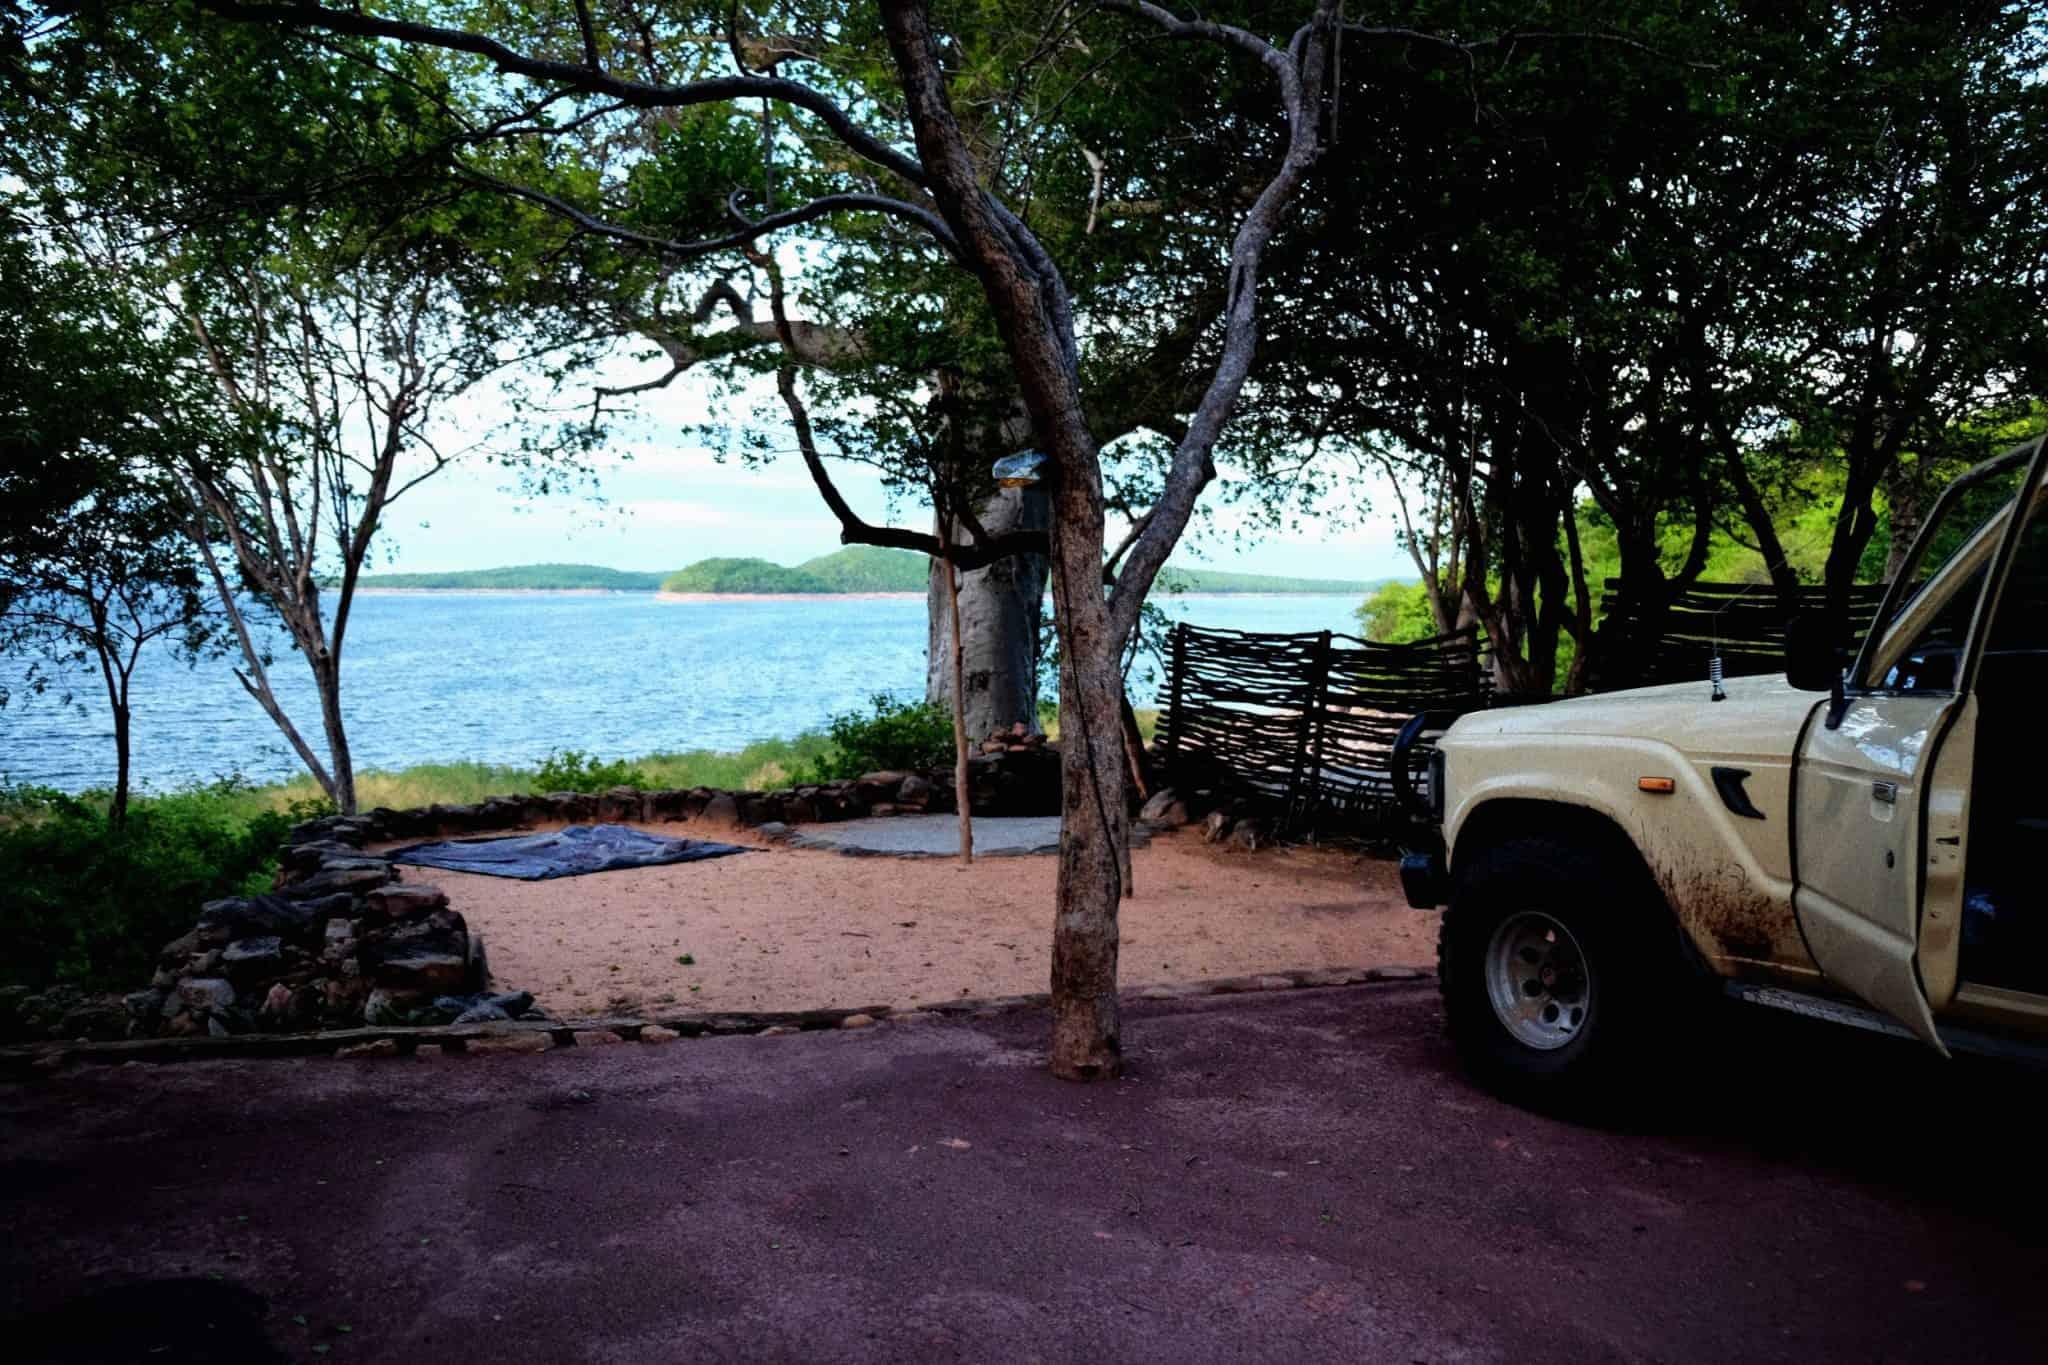 Binga Lake Kariba